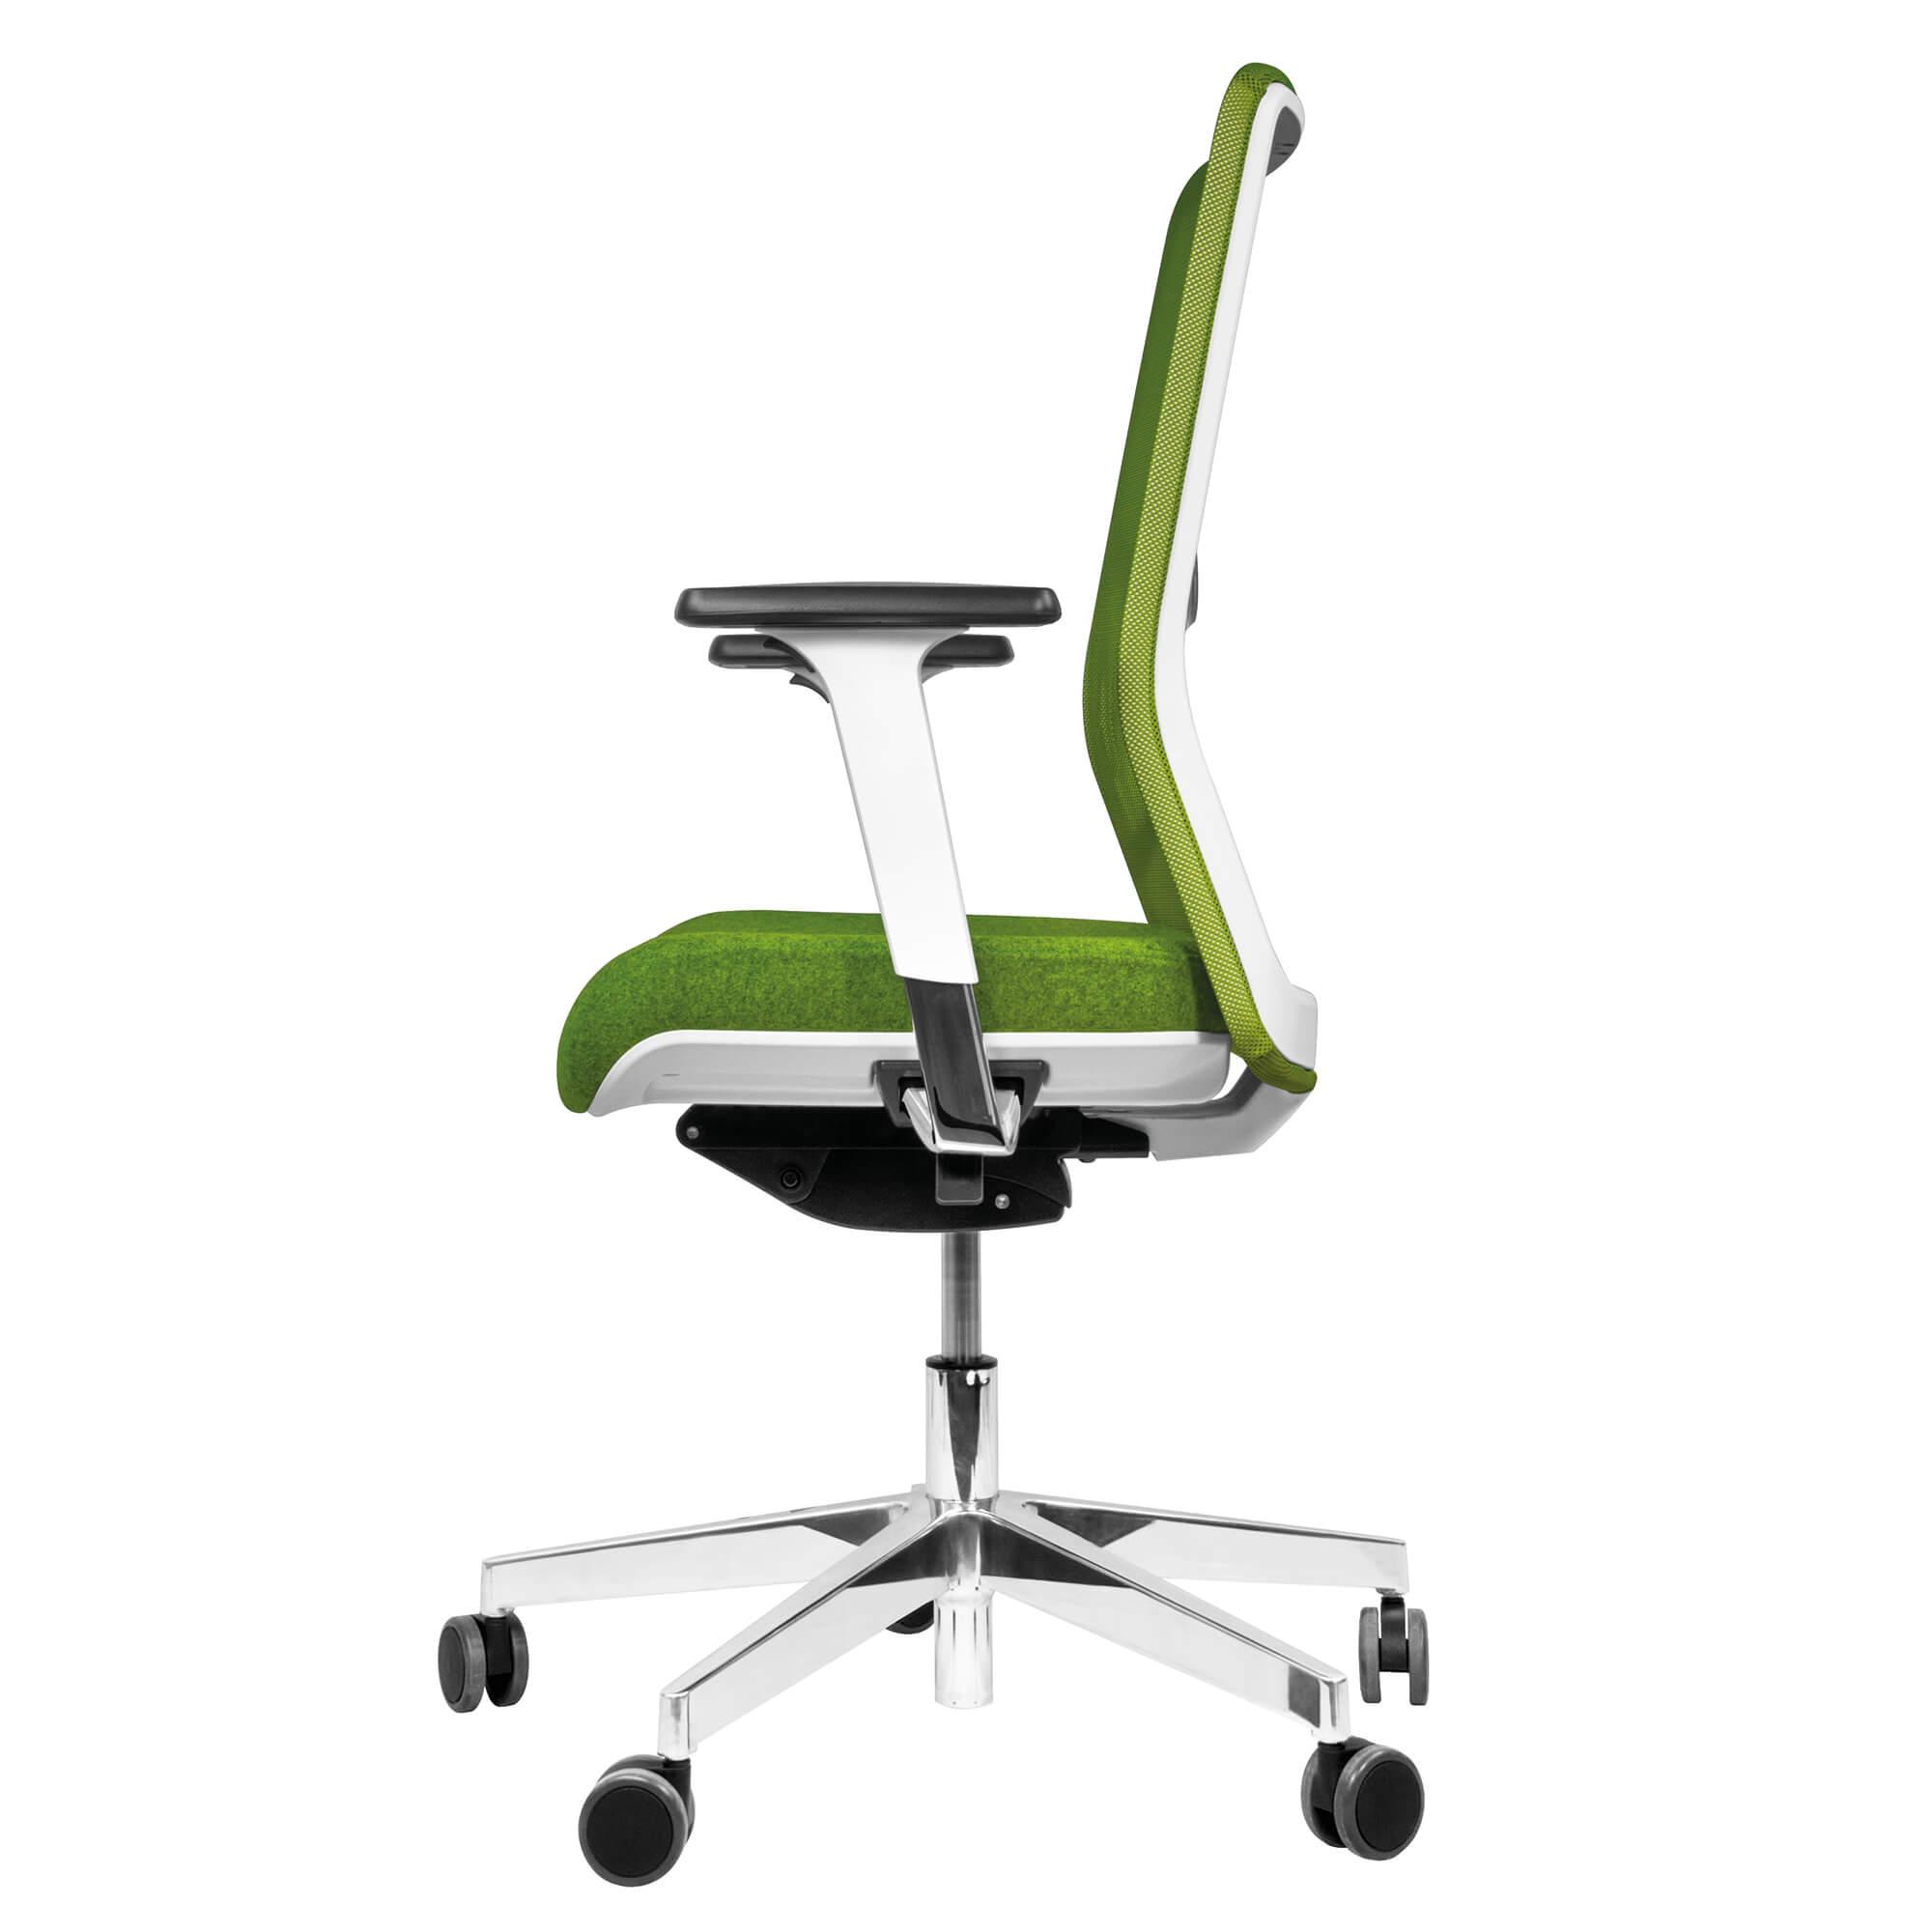 Bürodrehstuhl WIND Grün - Ergonomischer Premiumdrehstuhl - Bürostuhl - Drehstuhl